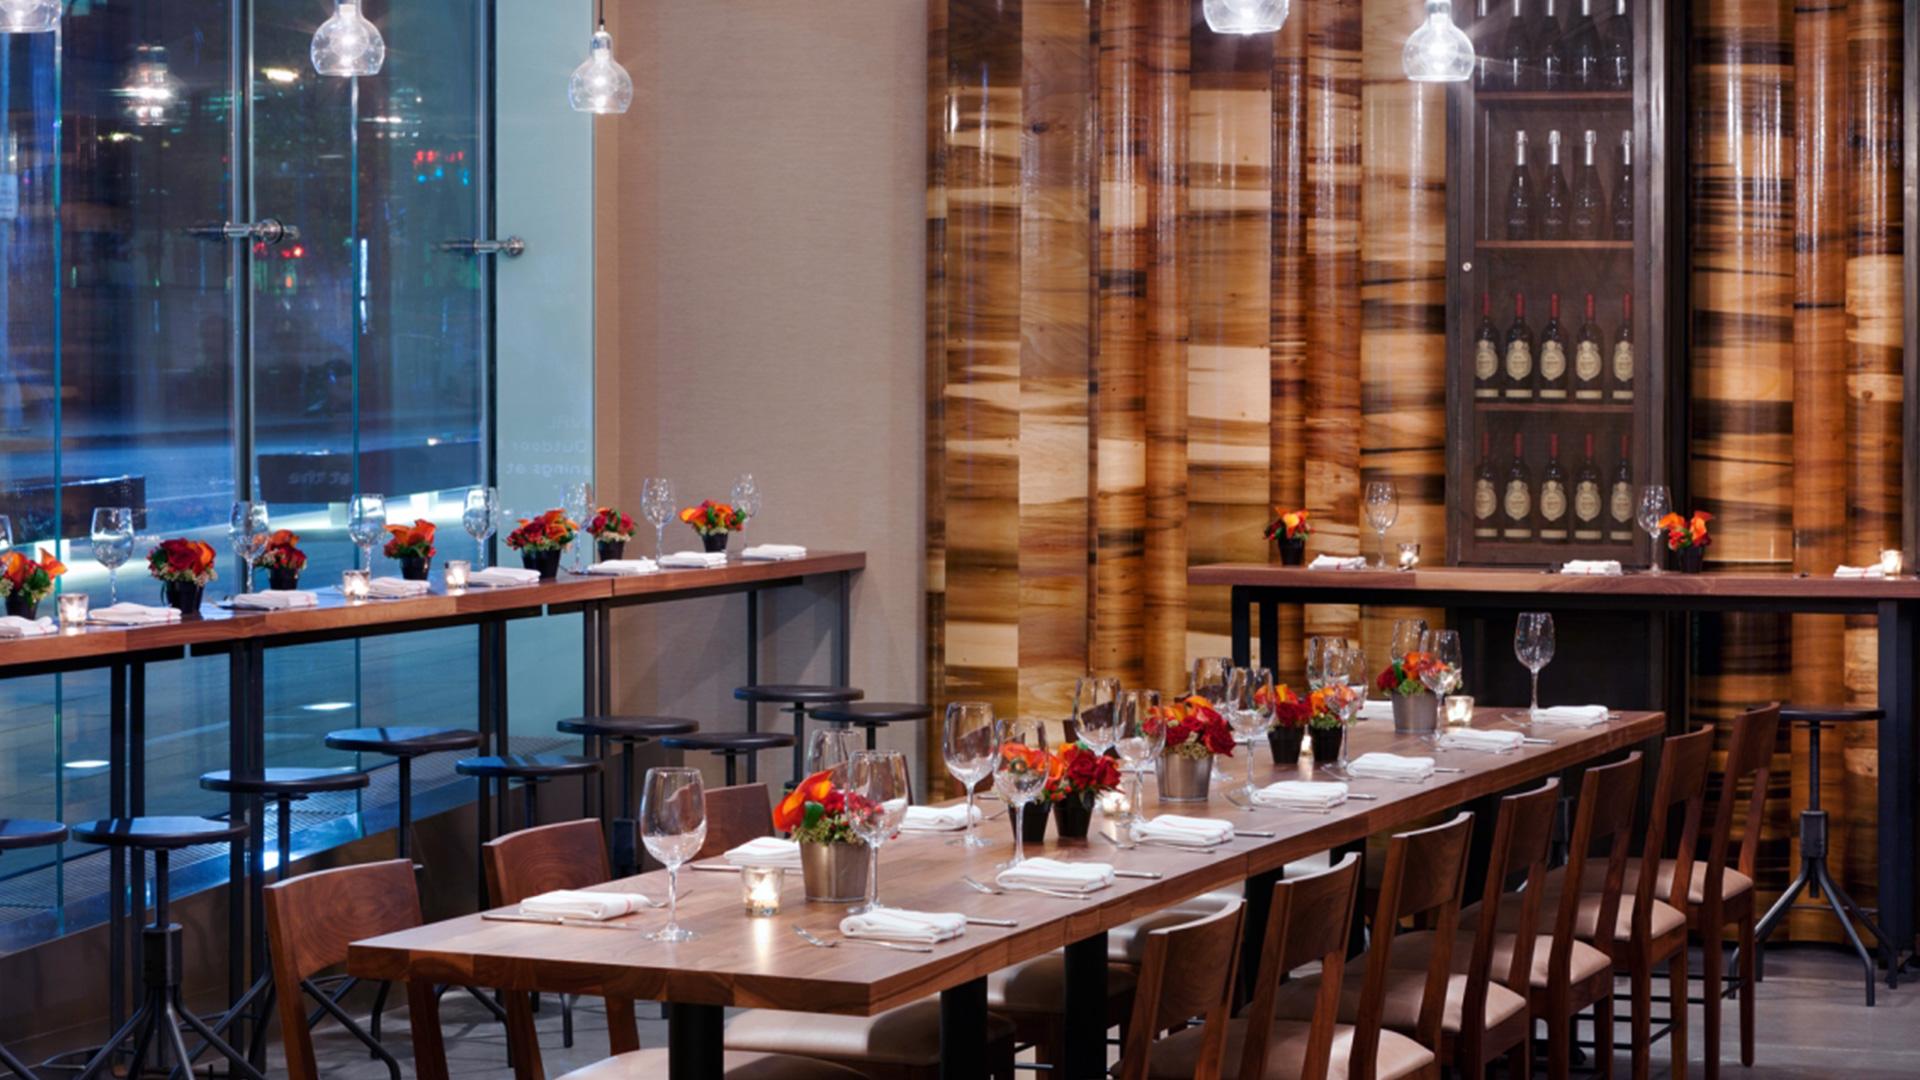 lincoln center - Lincoln Center Kitchen